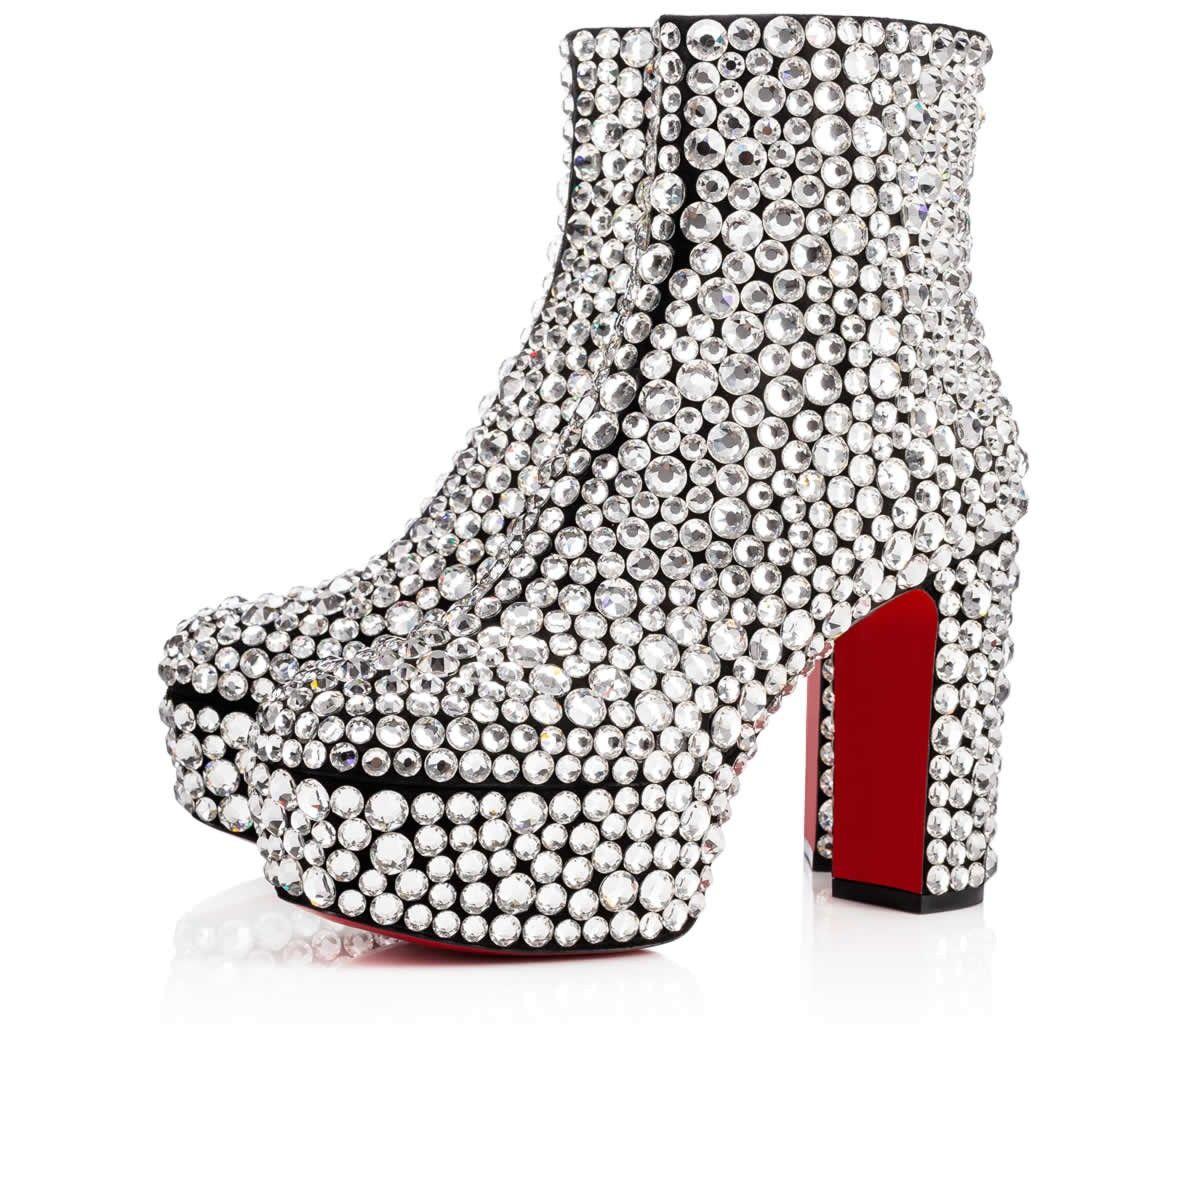 924e0dfddab Shoes - Roxxxy Strass - Christian Louboutin | Christian Louboutin in ...